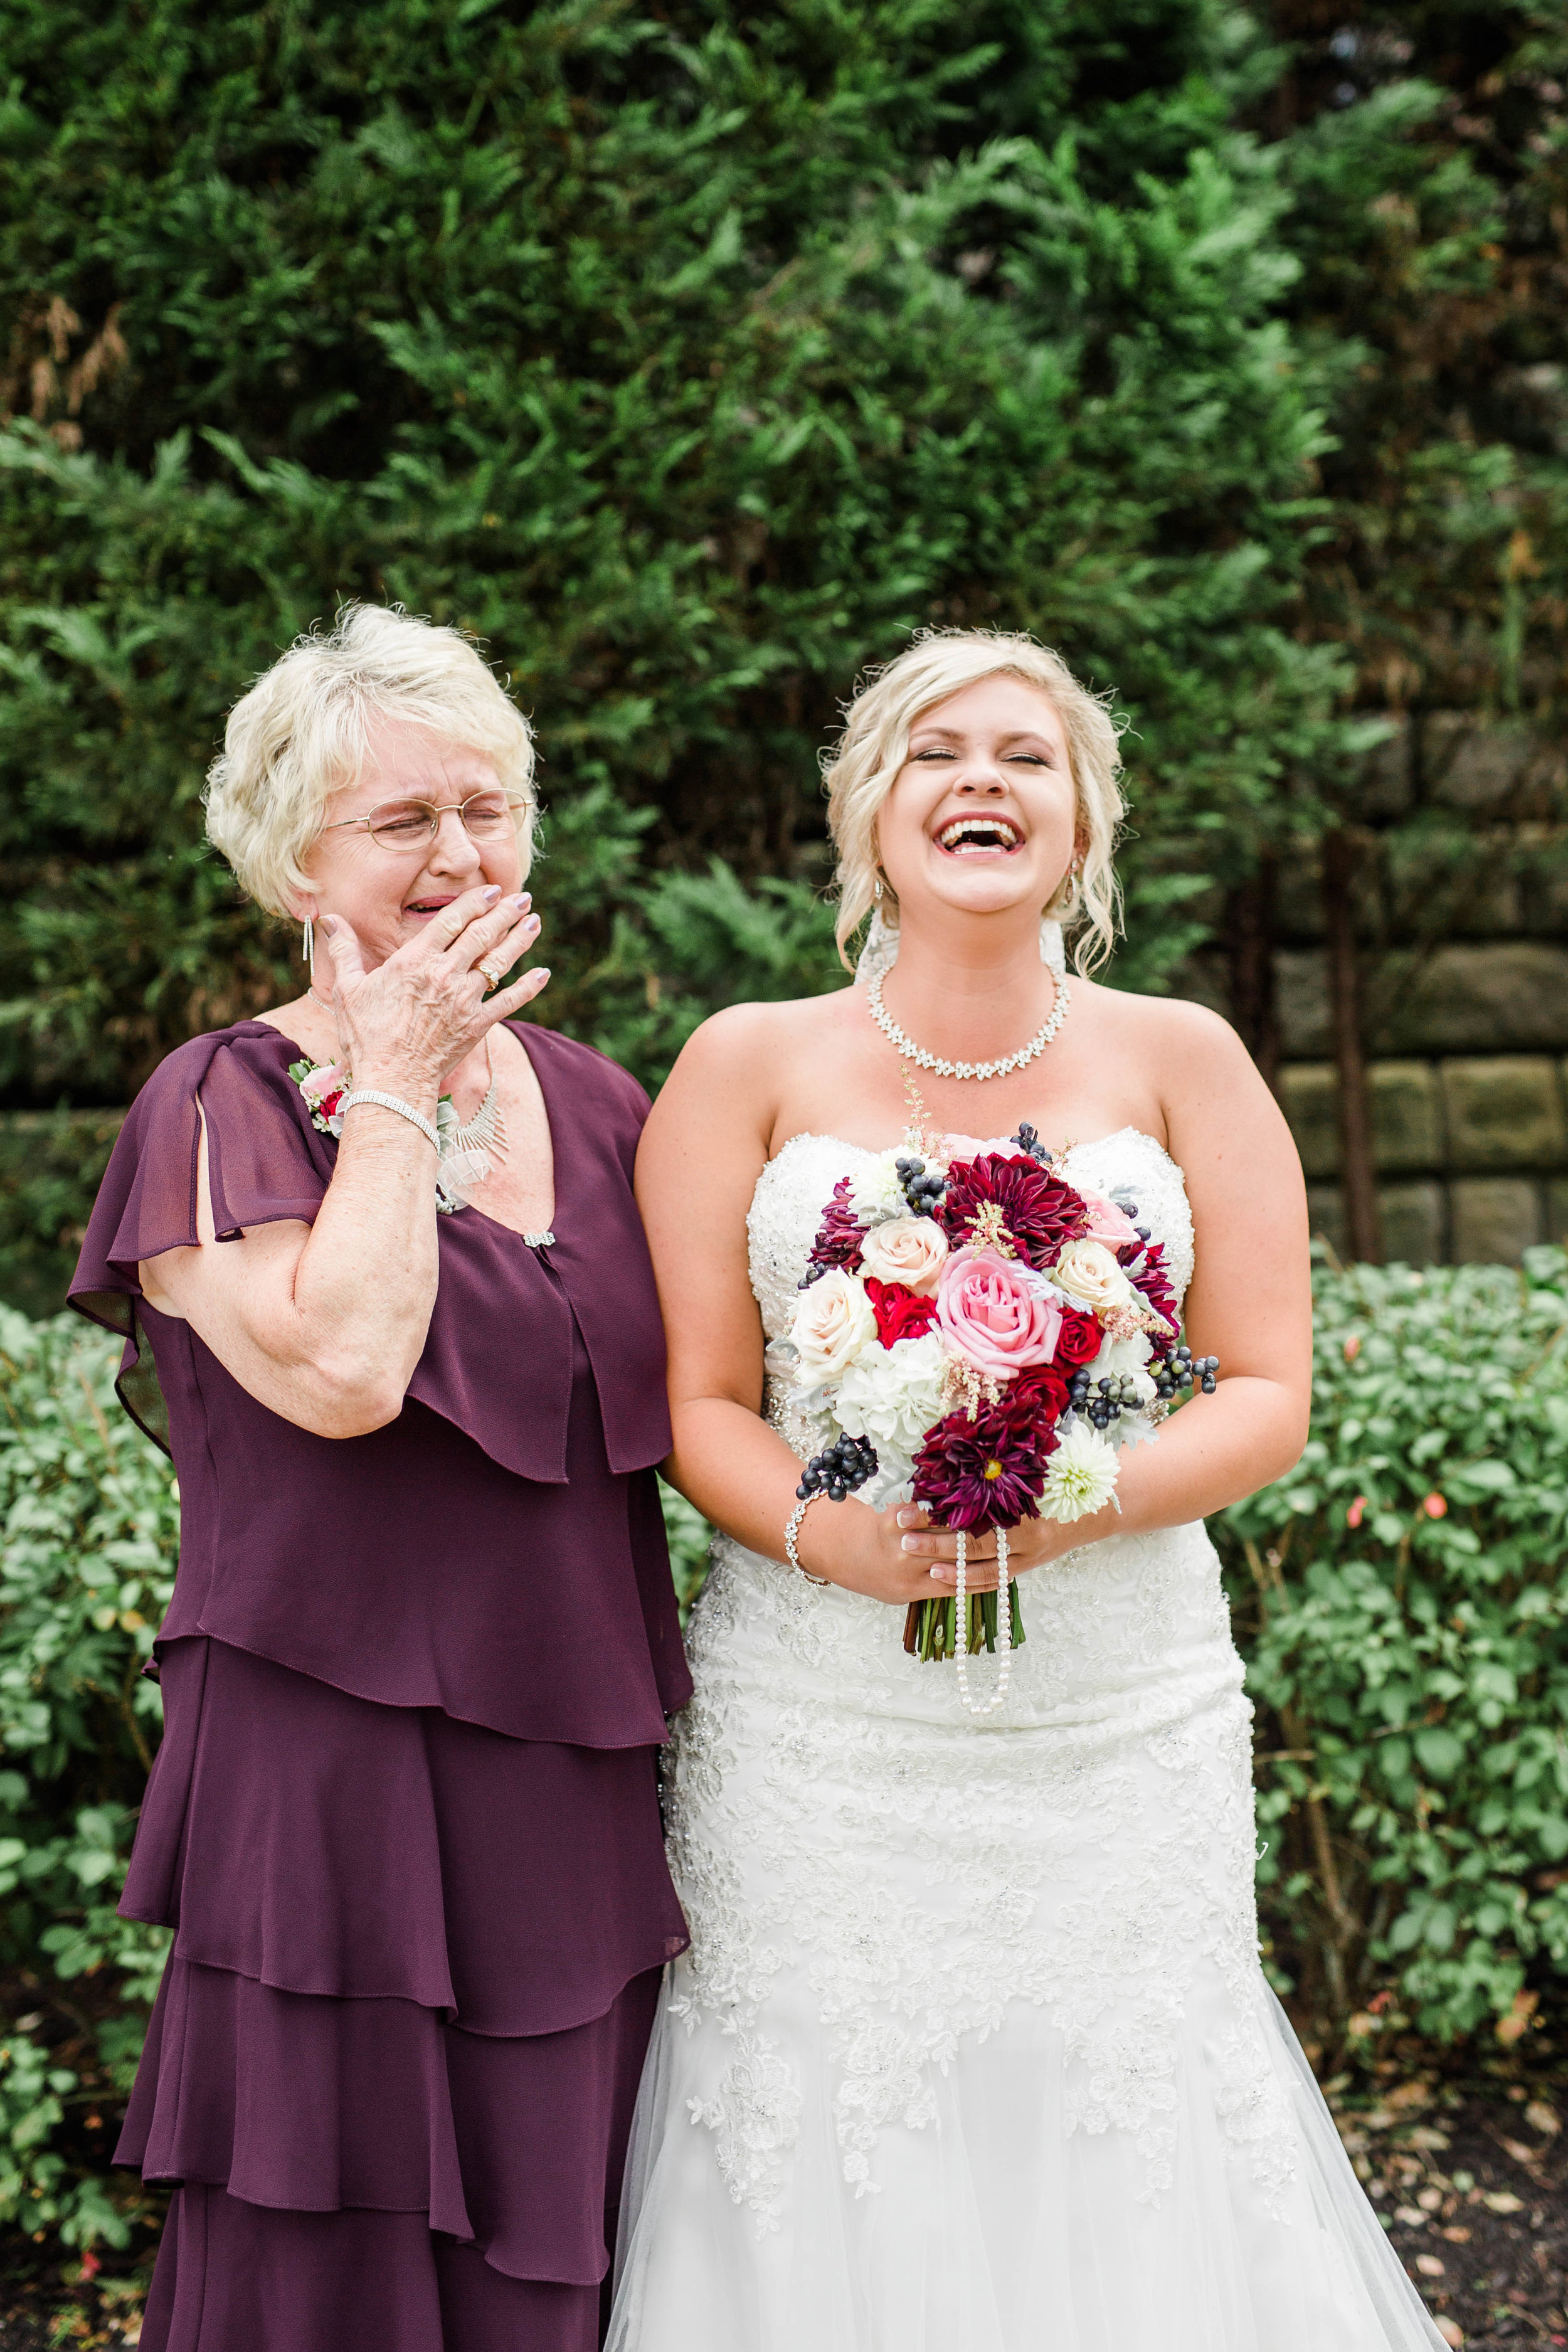 Sarah_Connor_Kara_Blakeman_Photography_2018_wv_barn_wedding-1238.jpg